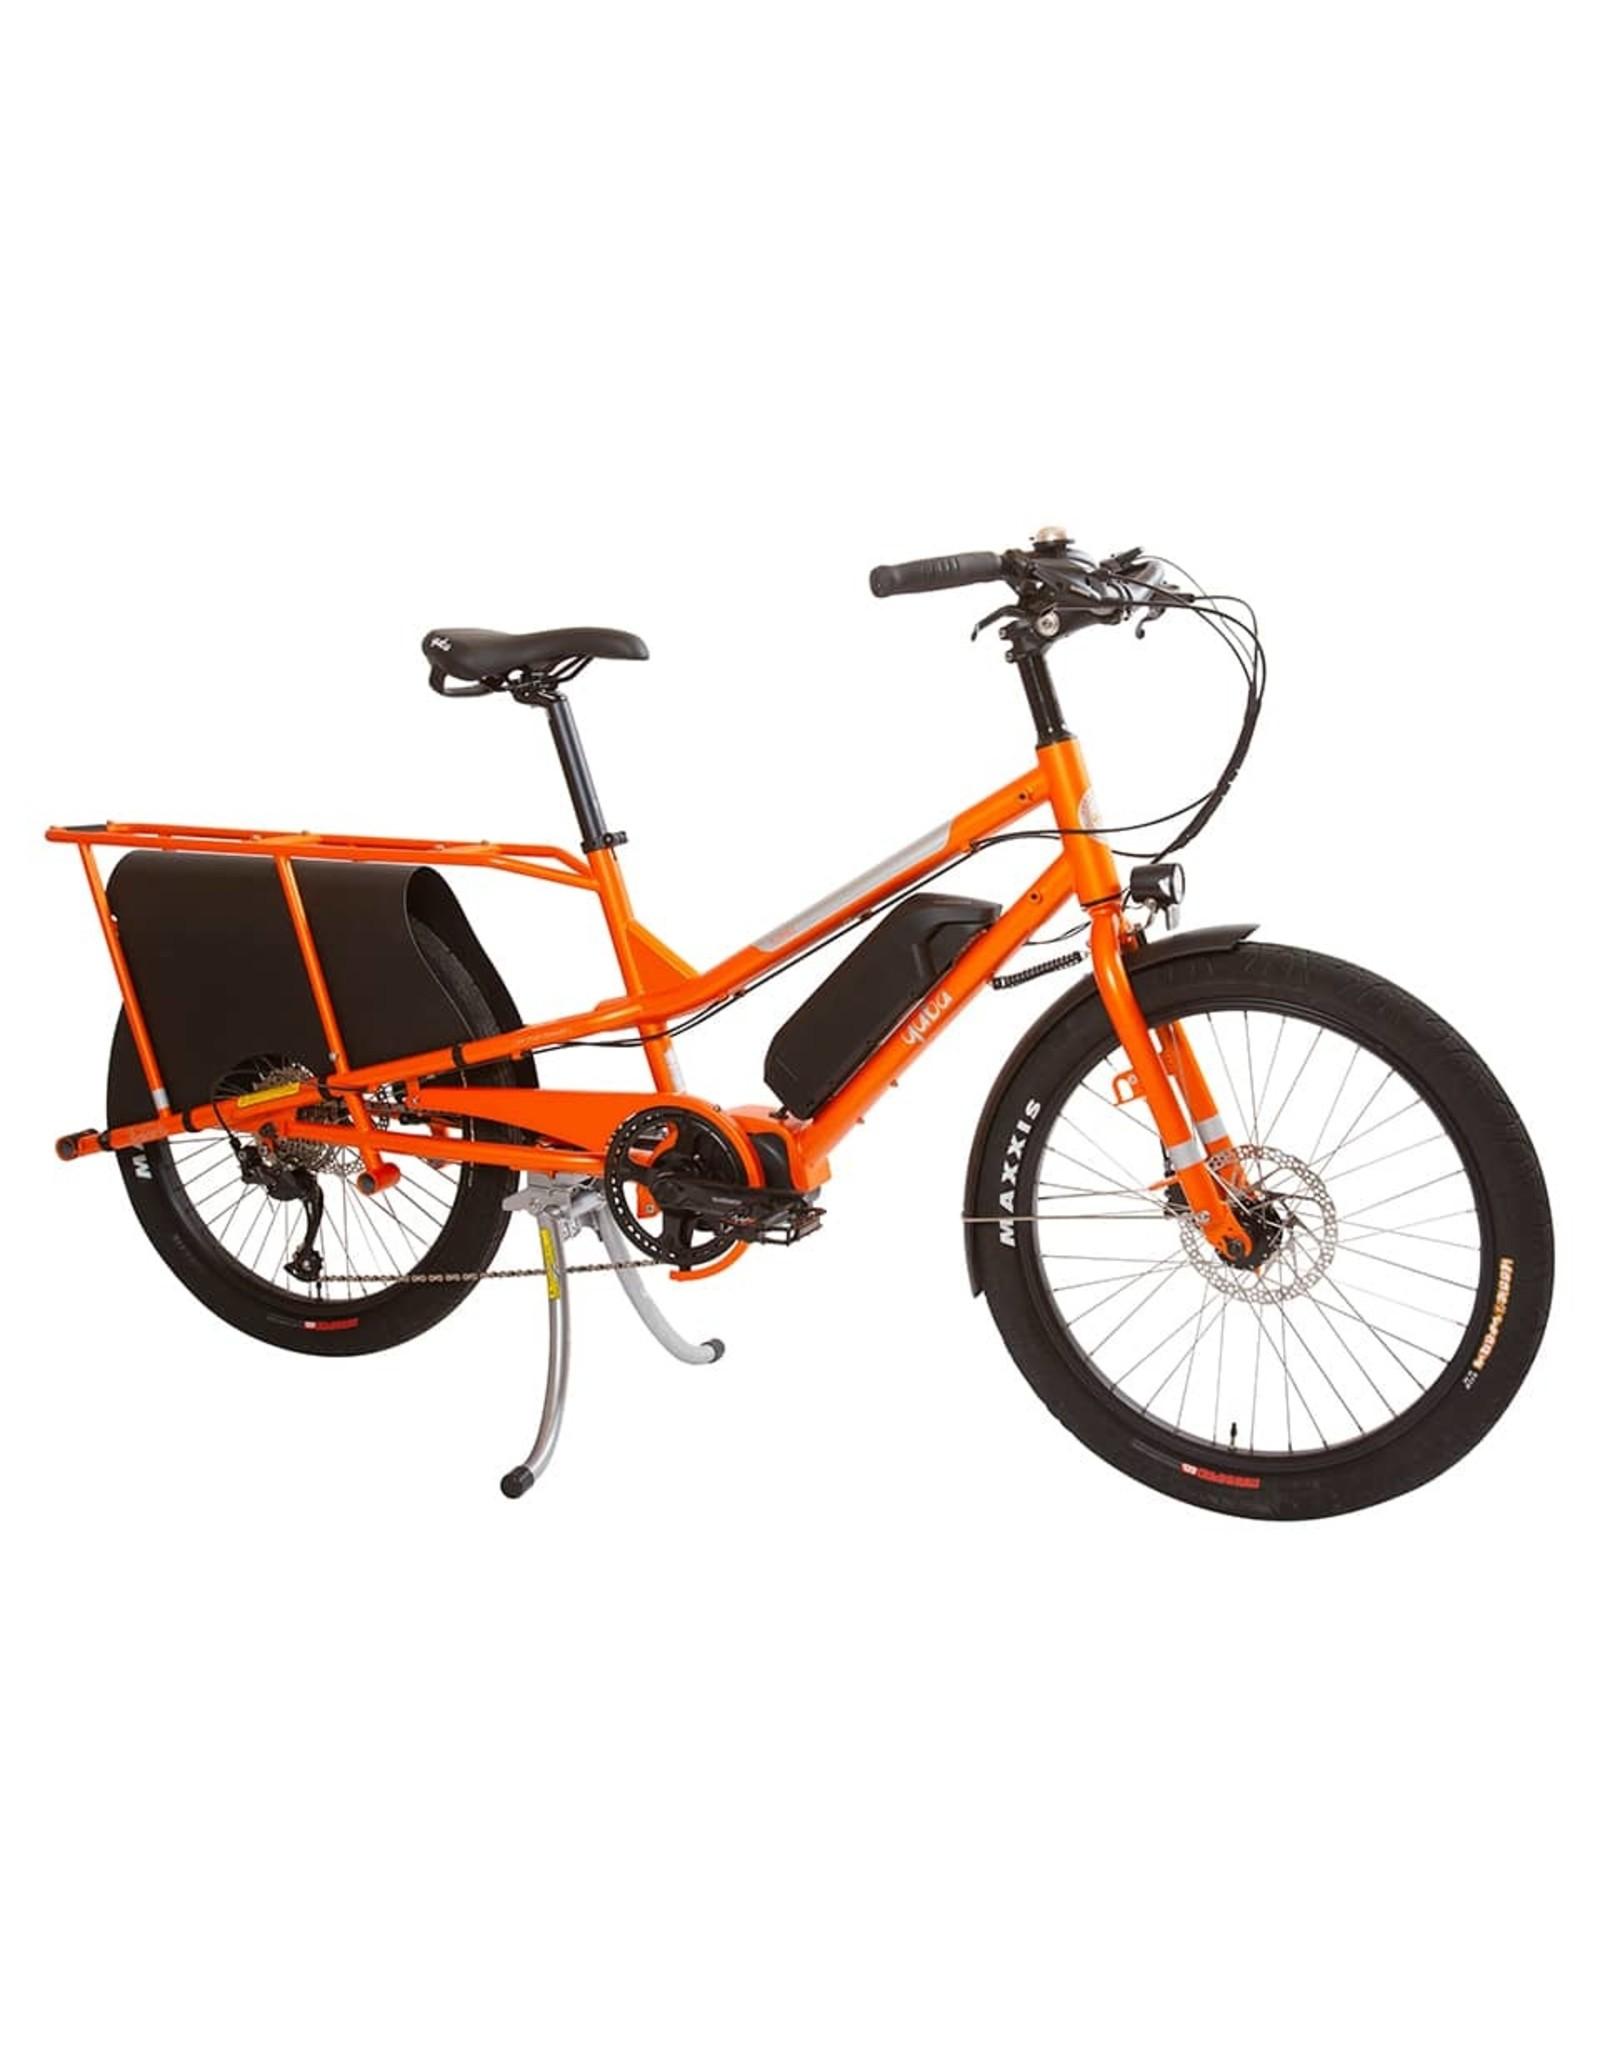 YUBA YUBA Kombi E5 Cargo 9 speed Orange cargo e-bike